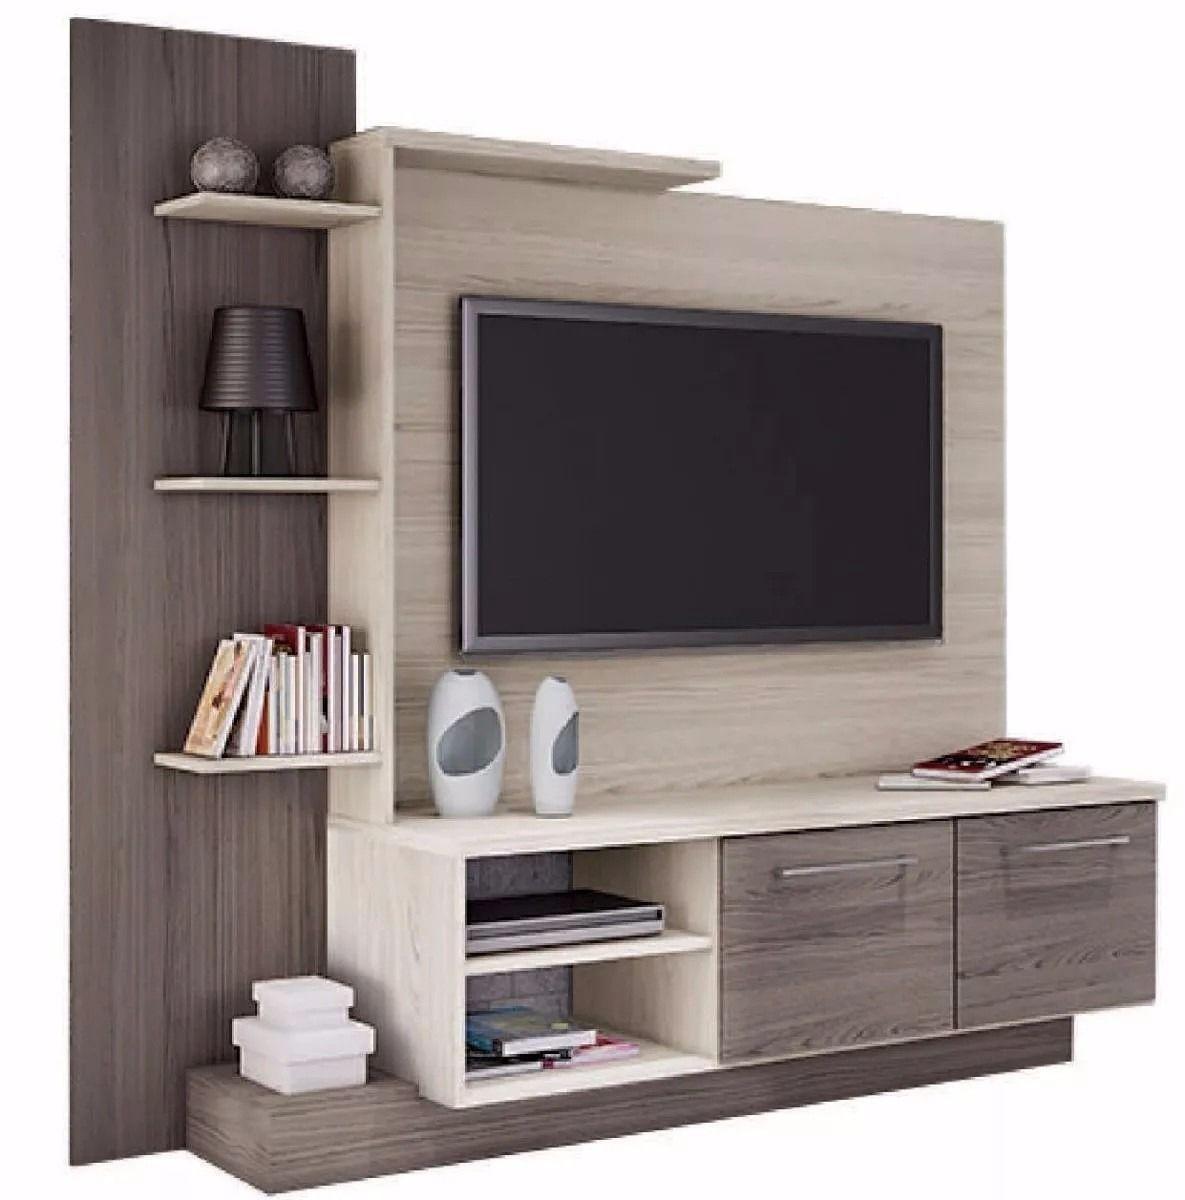 Rack mesa tv led lcd mueble de comedor modular home for Muebles comedor modulares